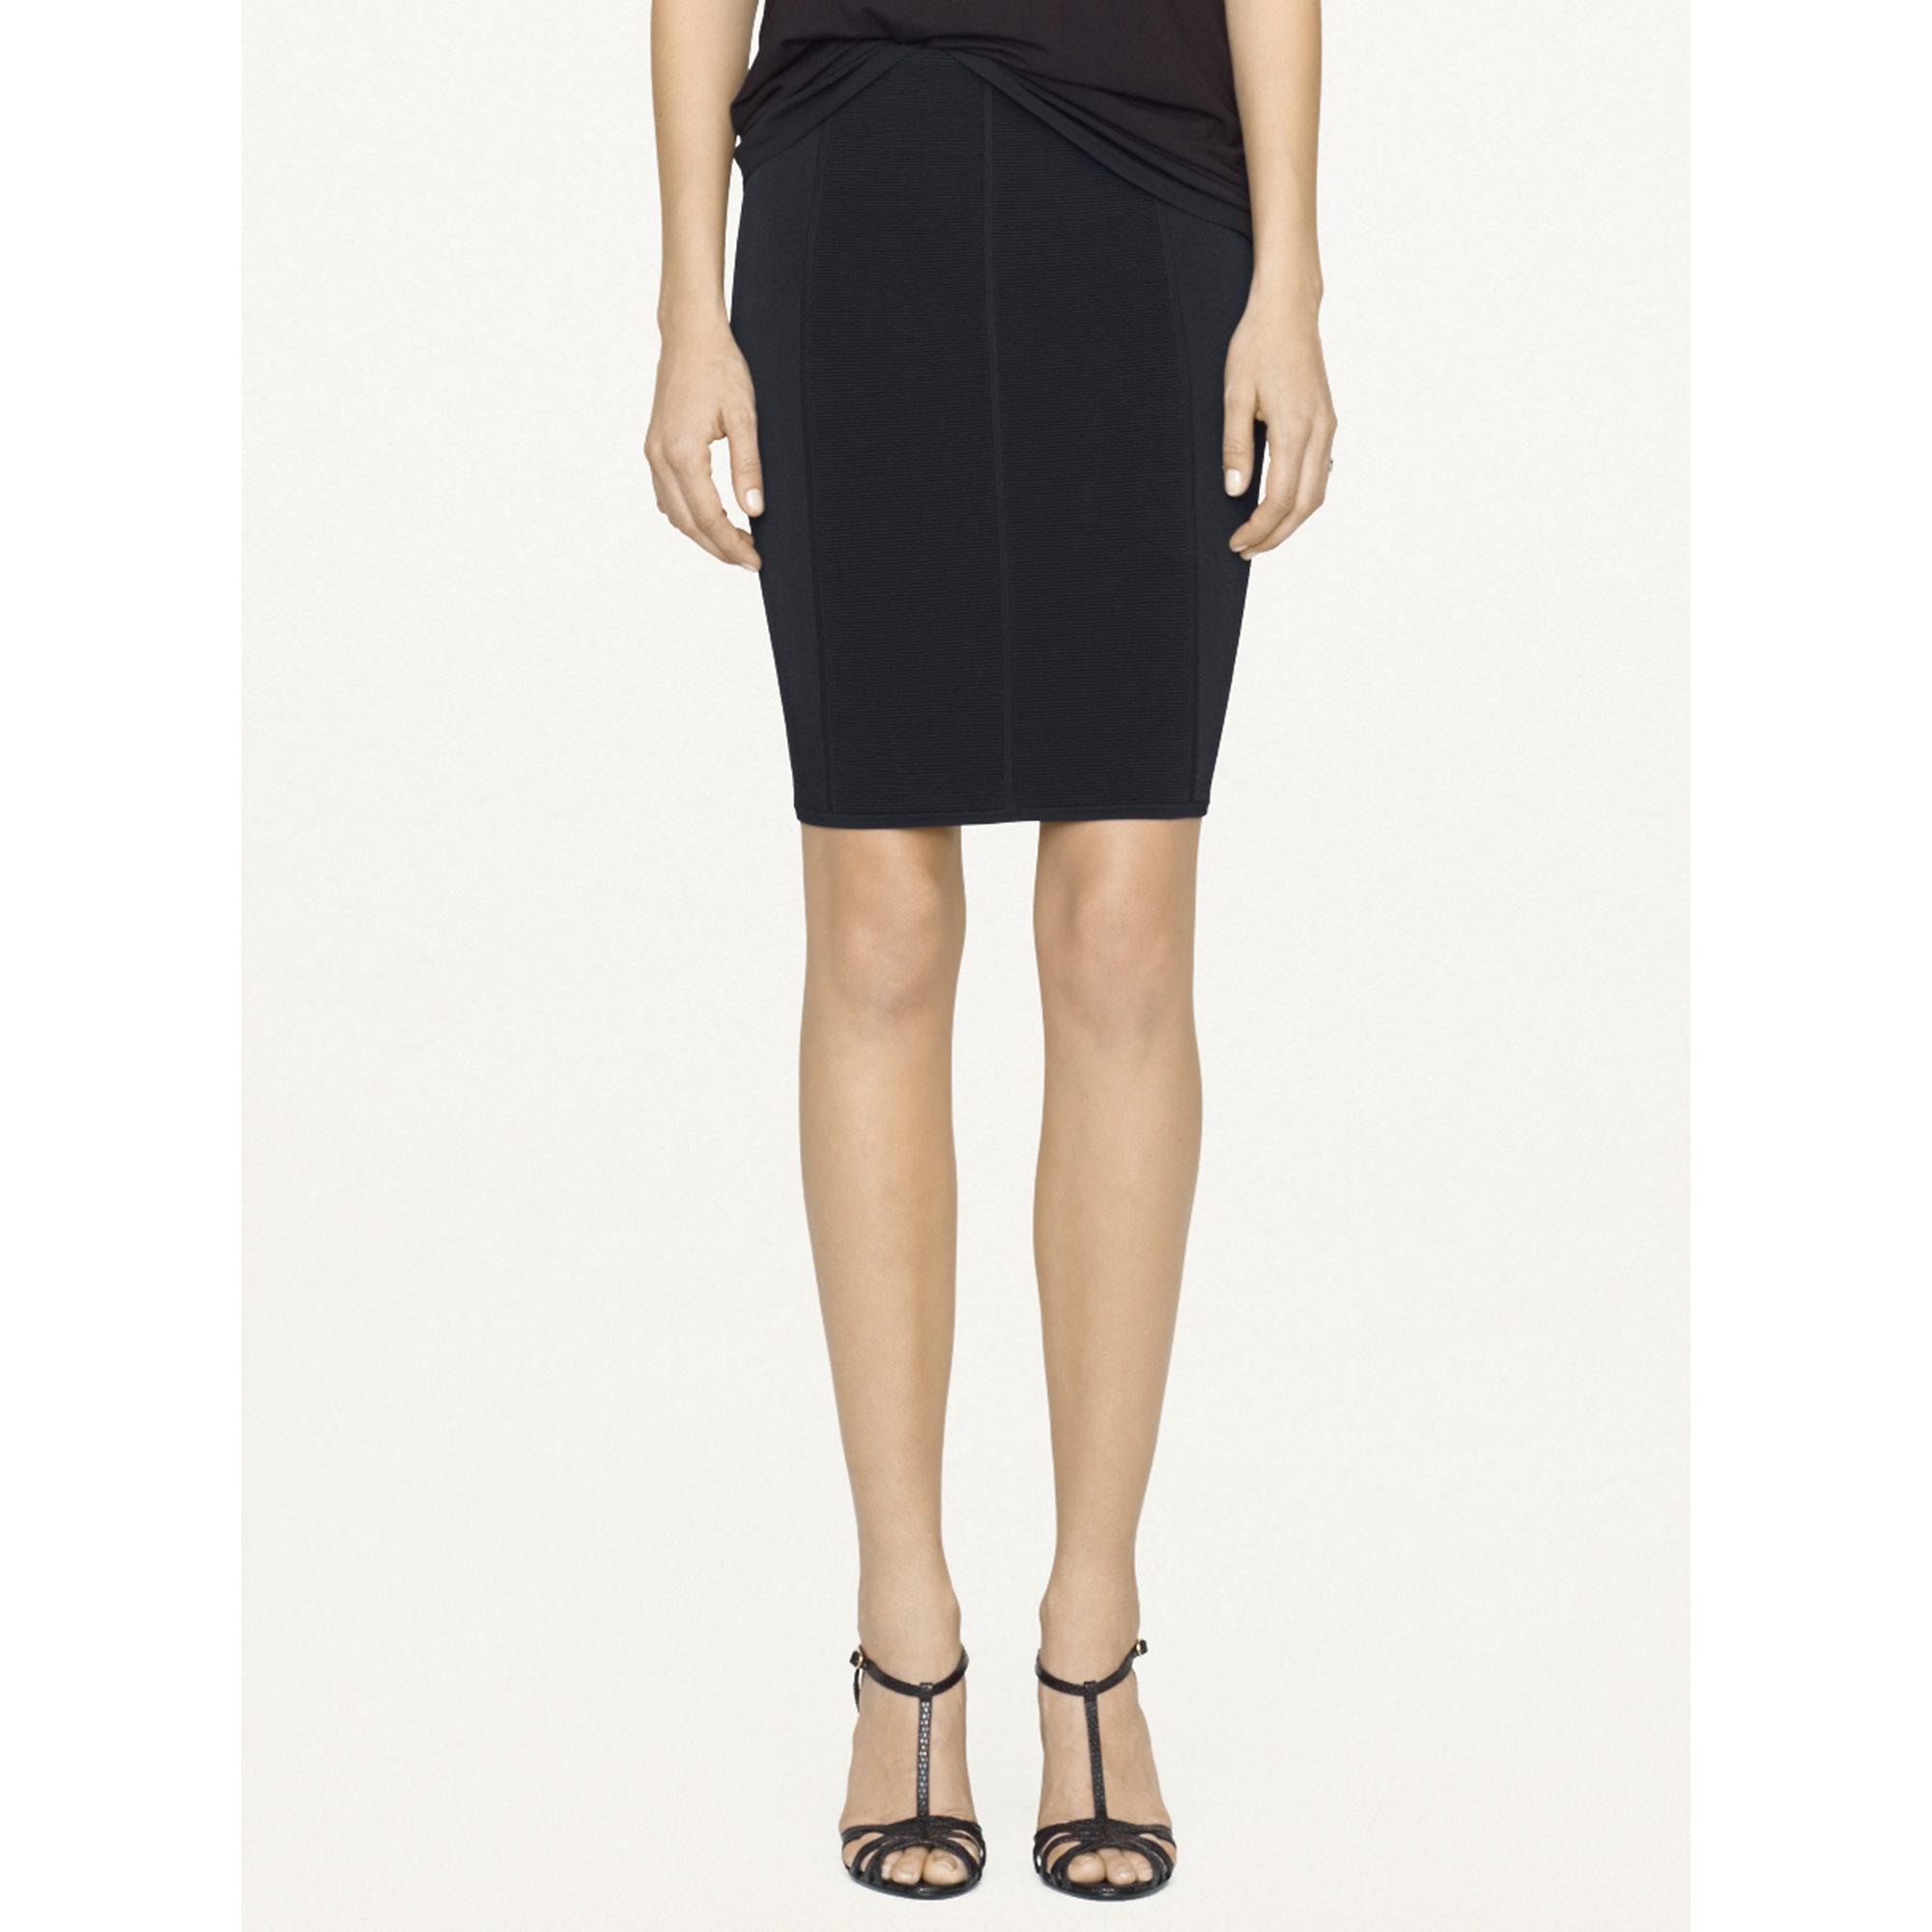 ralph black label stretch pencil skirt in black lyst